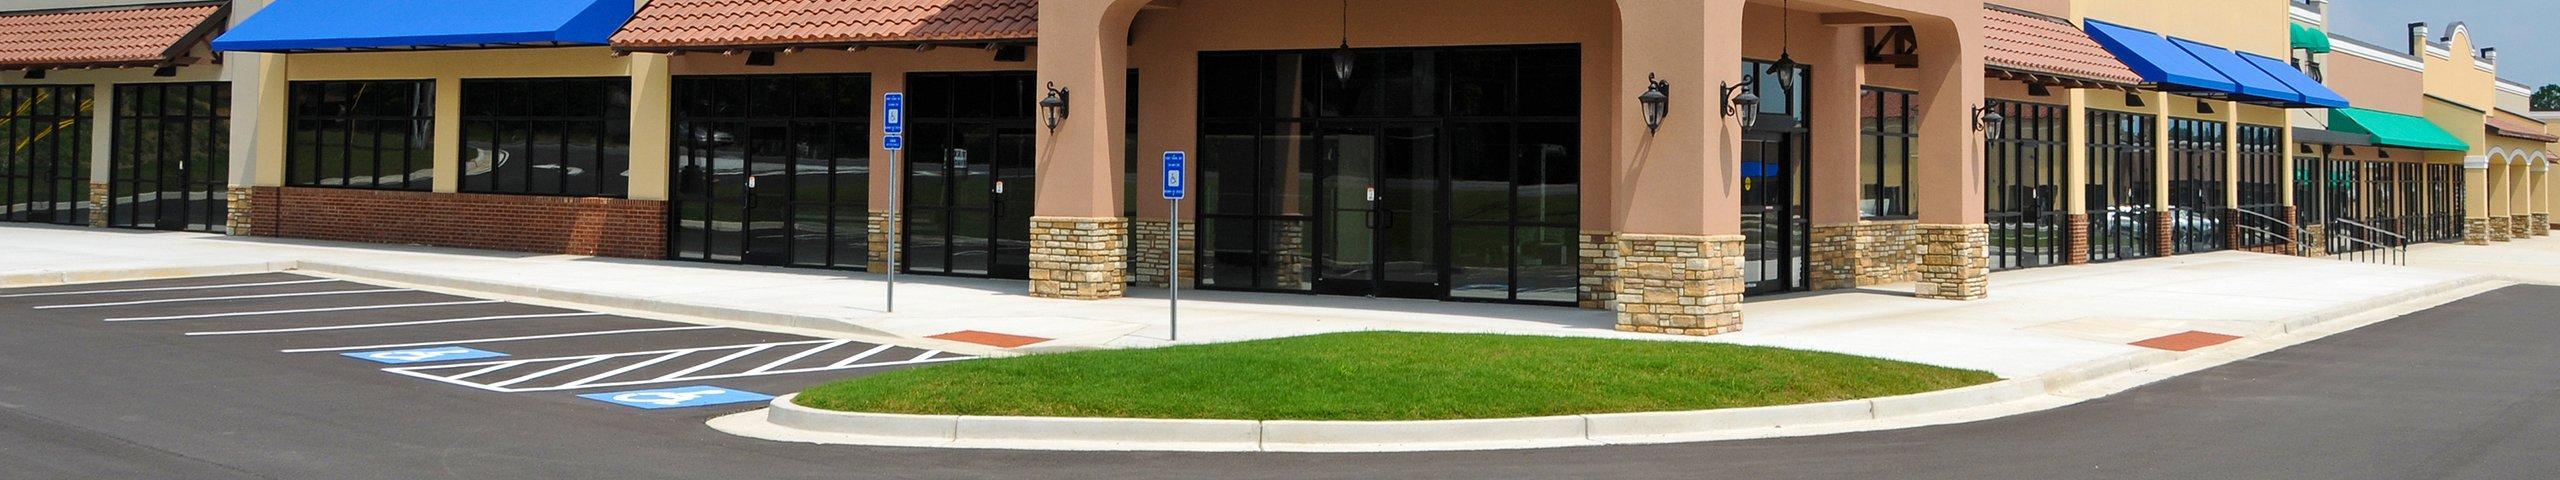 commercial buildings in san angelo texas